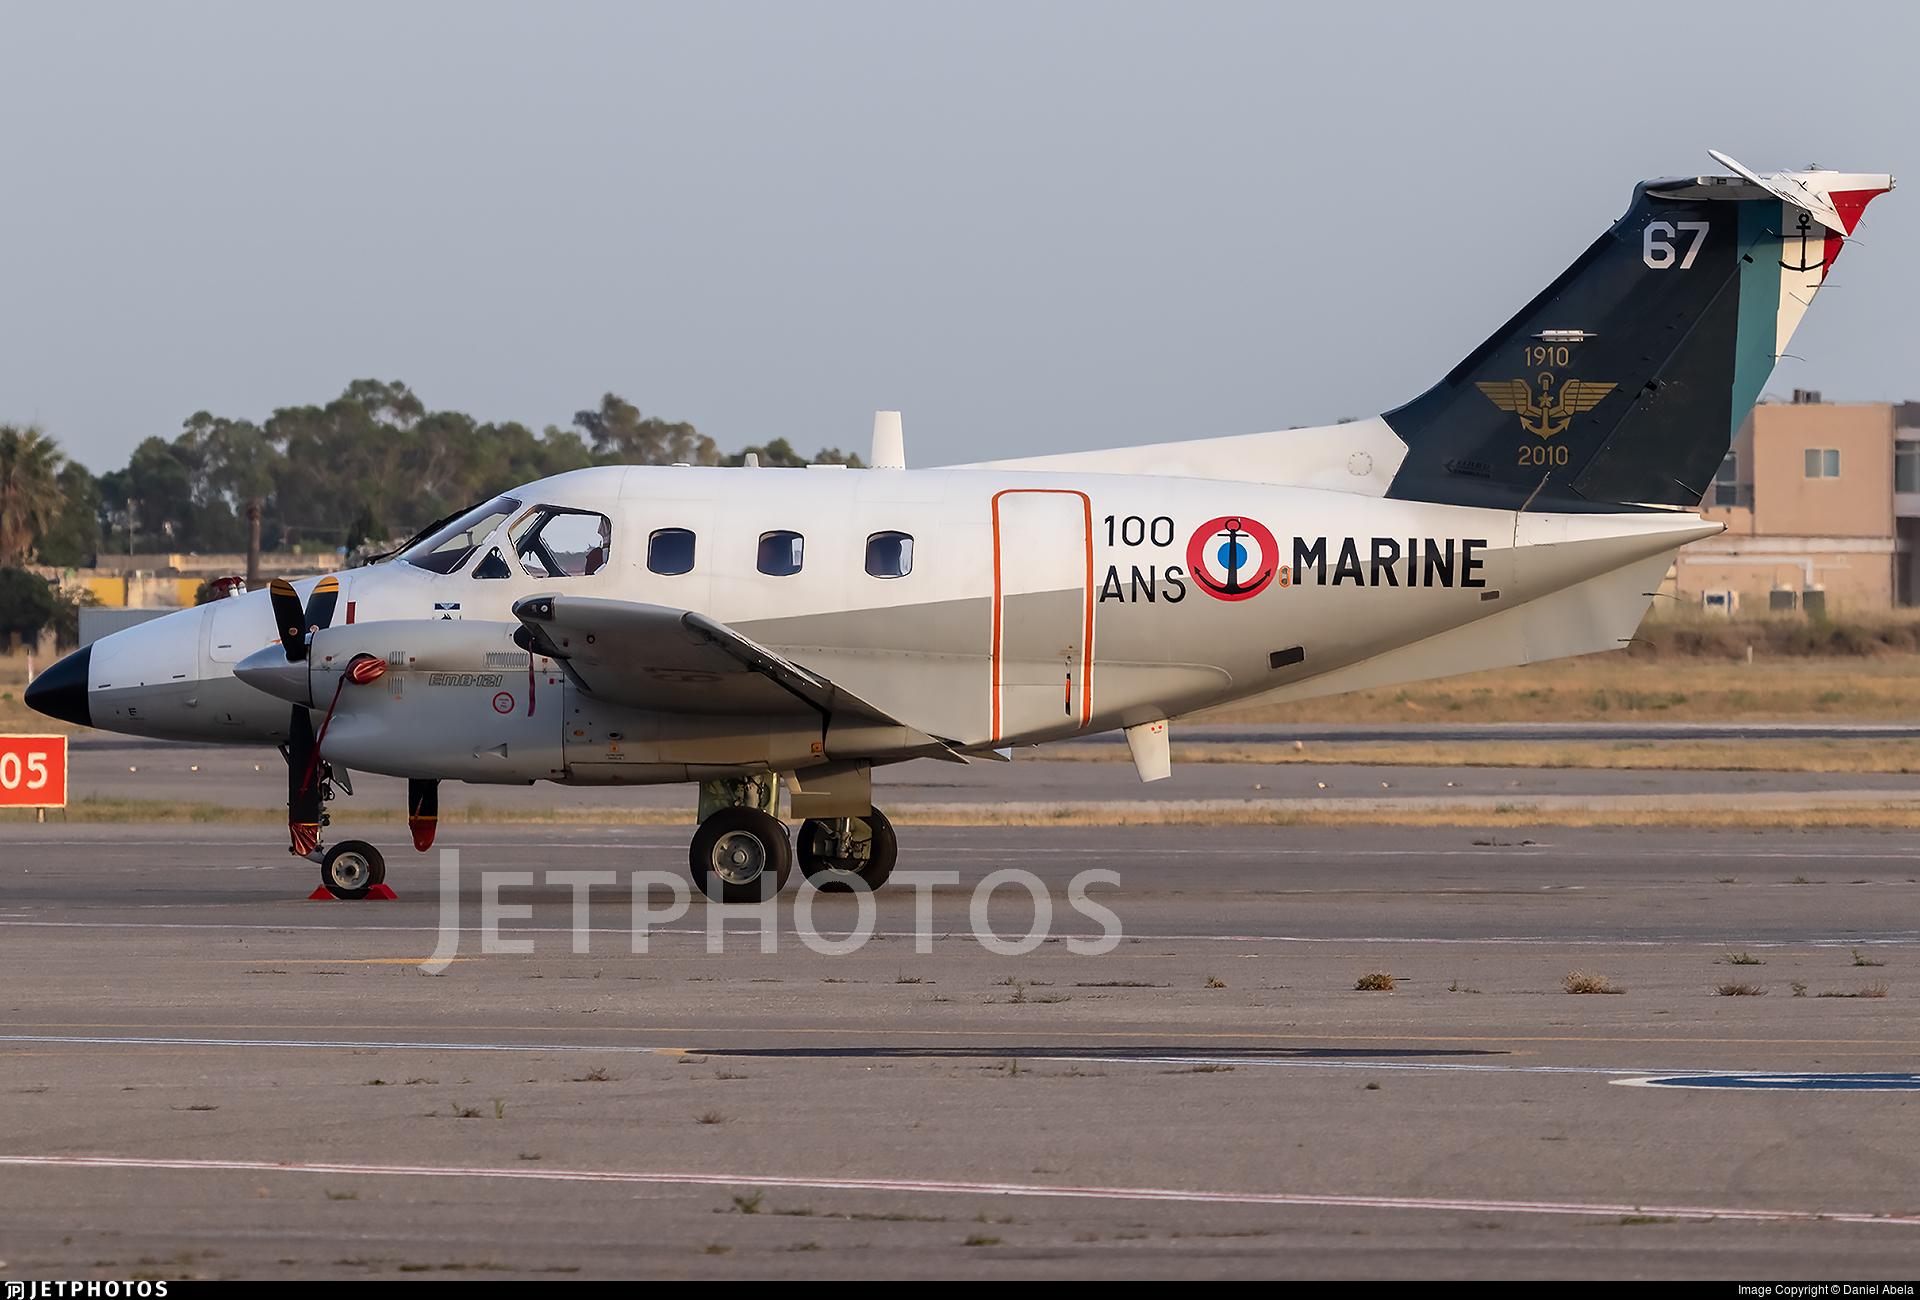 67 - Embraer EMB-121AN Xingú - France - Navy